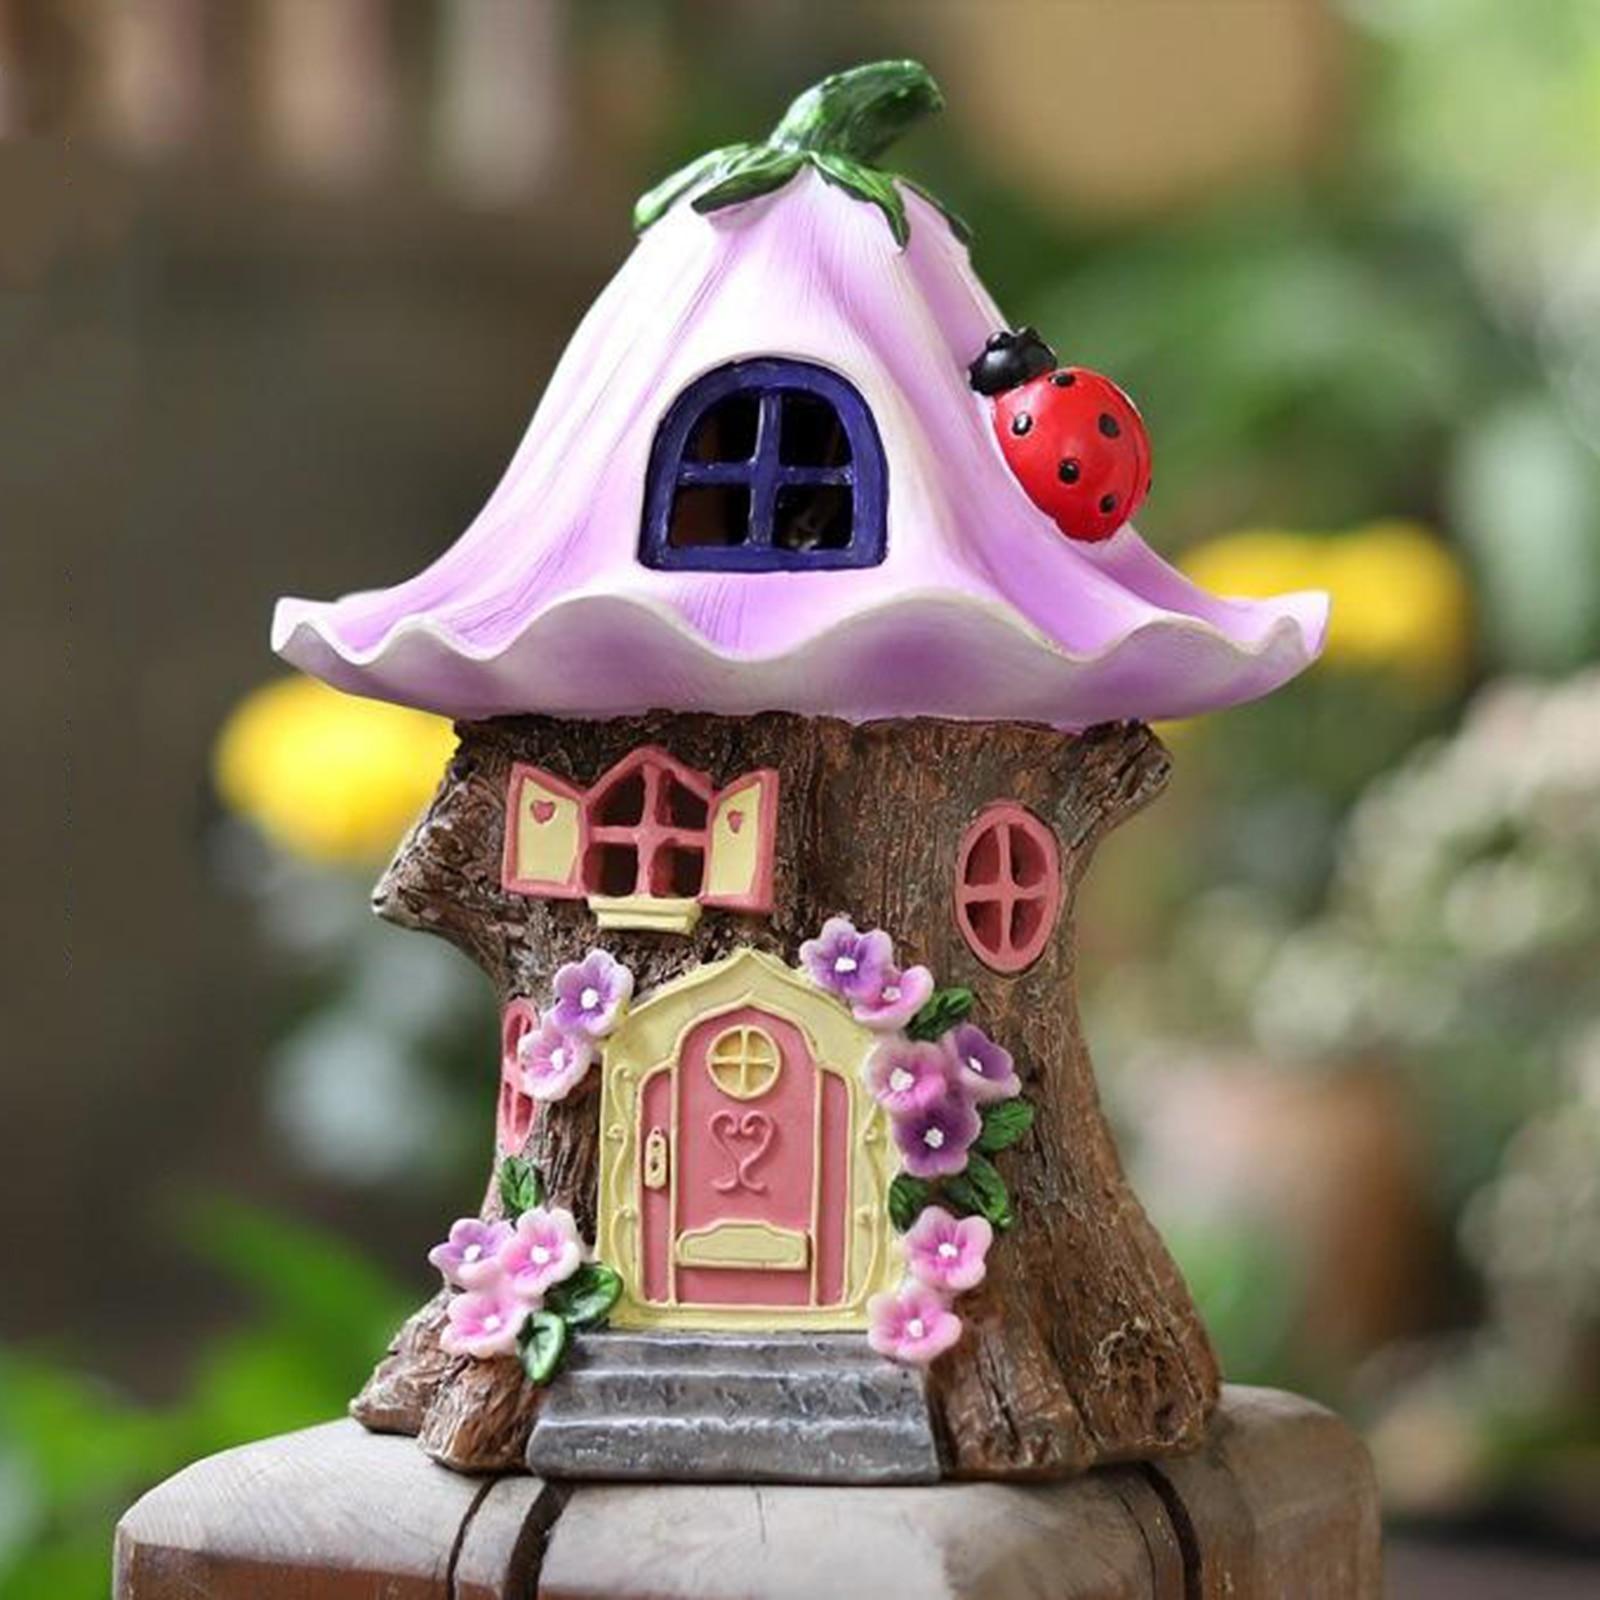 Craft Miniature Fairy House Solar Powered Outdoor Decor LED Garden Light Yard Walkway Decoration Led Light